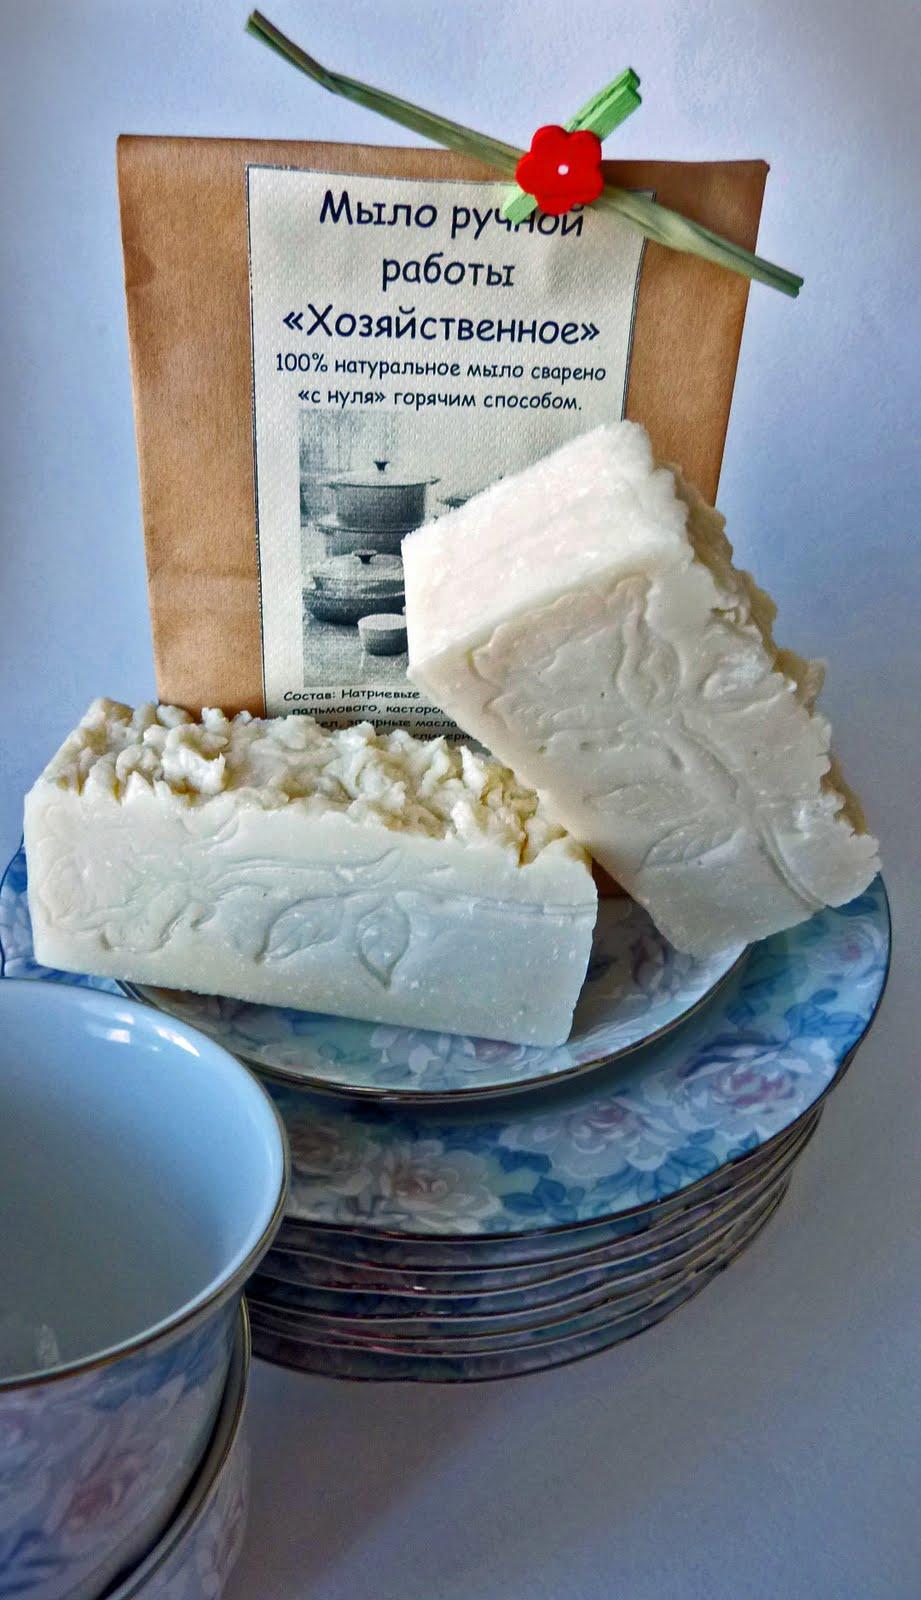 Варим мыло в домашних условиях рецепты с фото пошагово